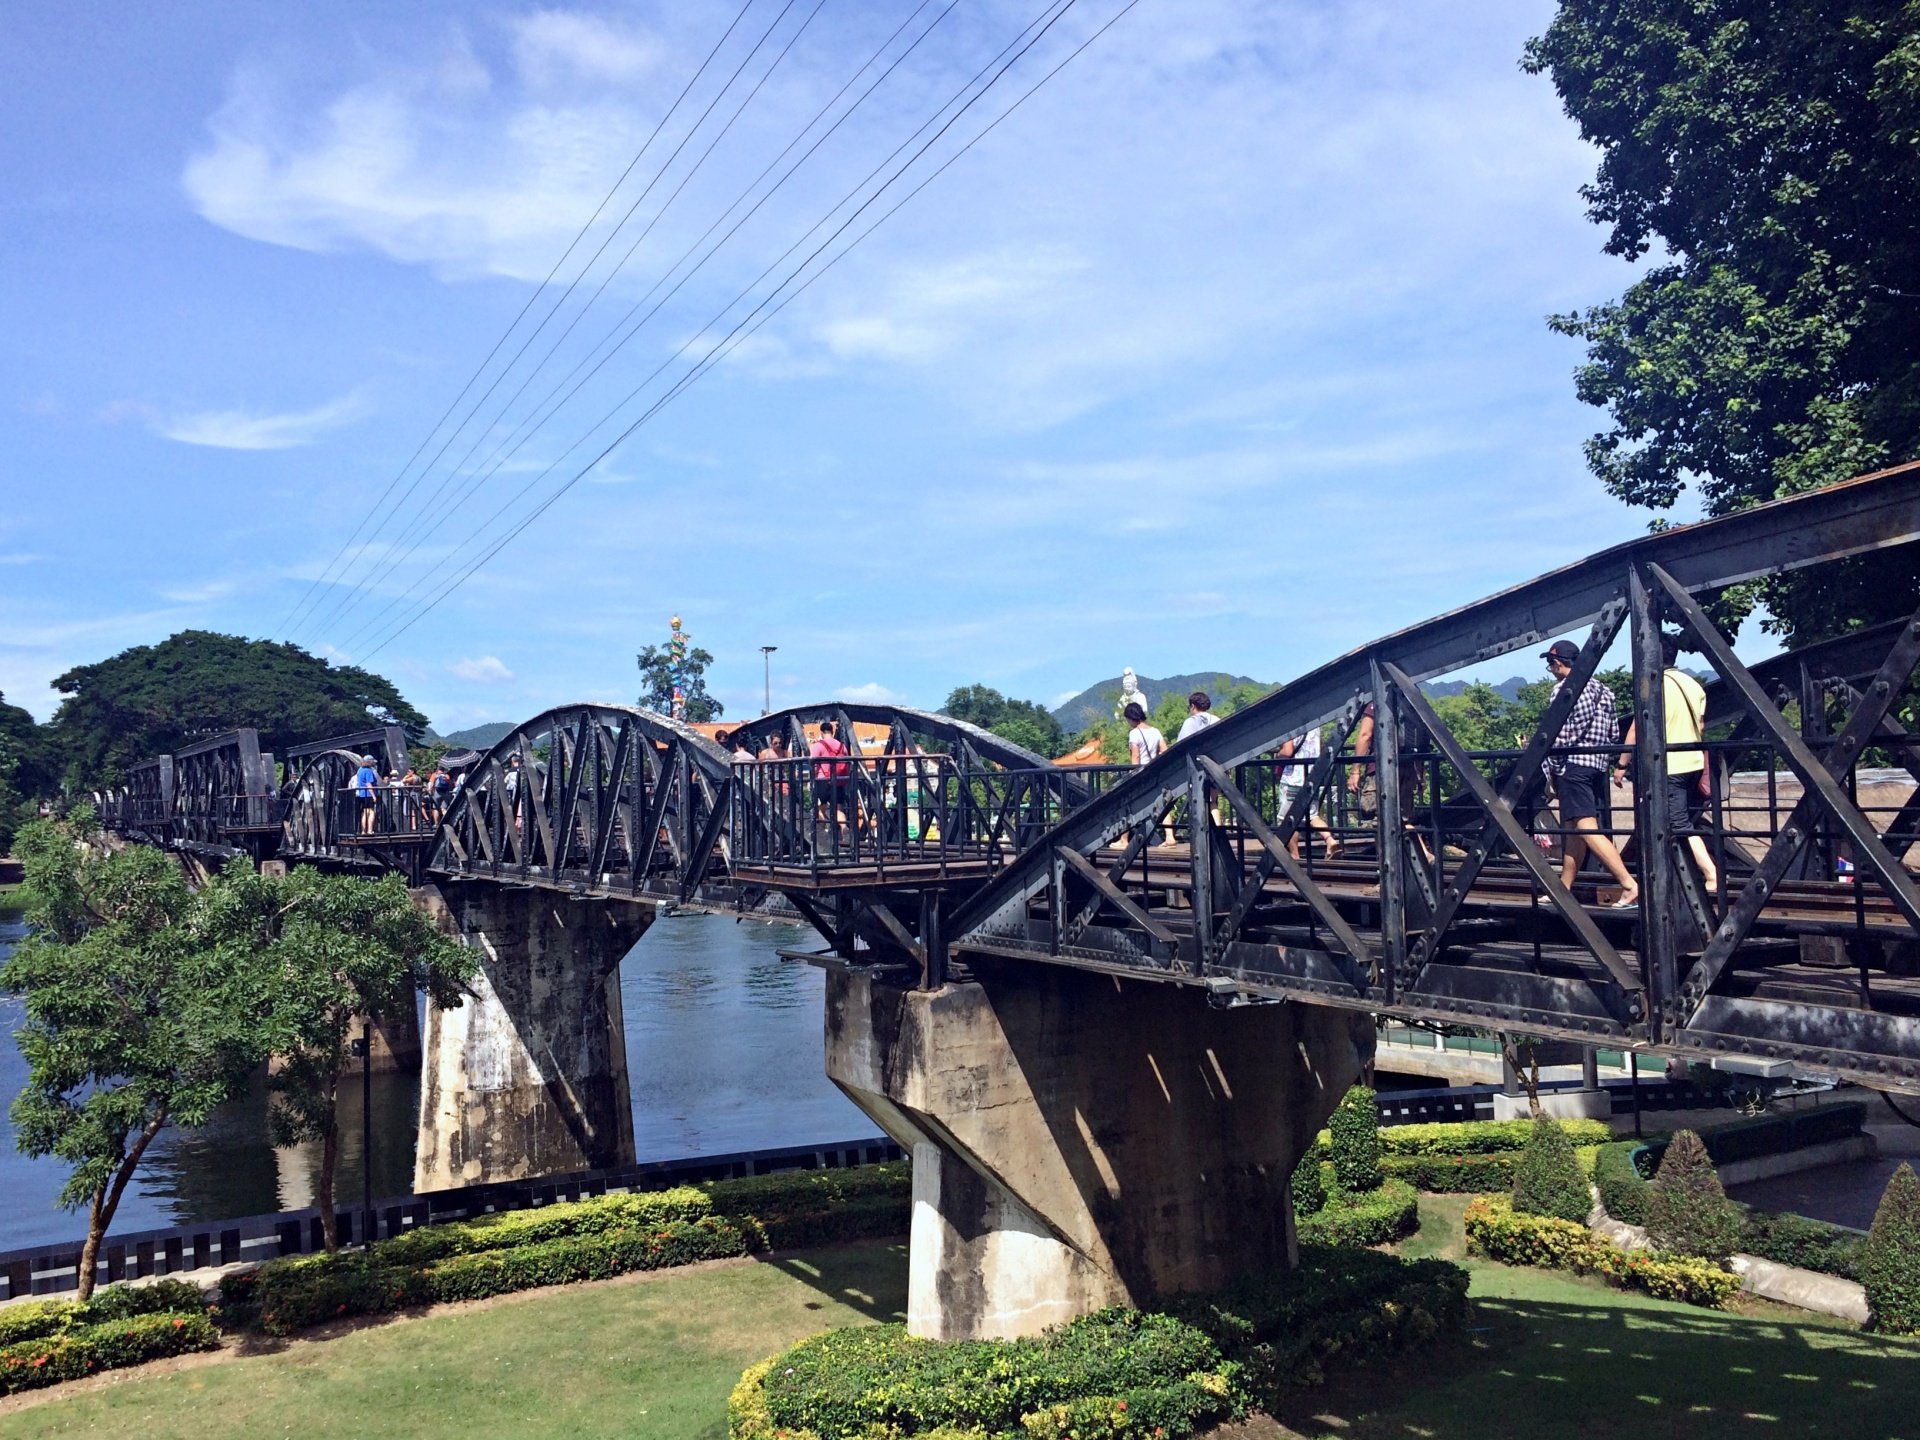 vany visits kanchanaburi thailand